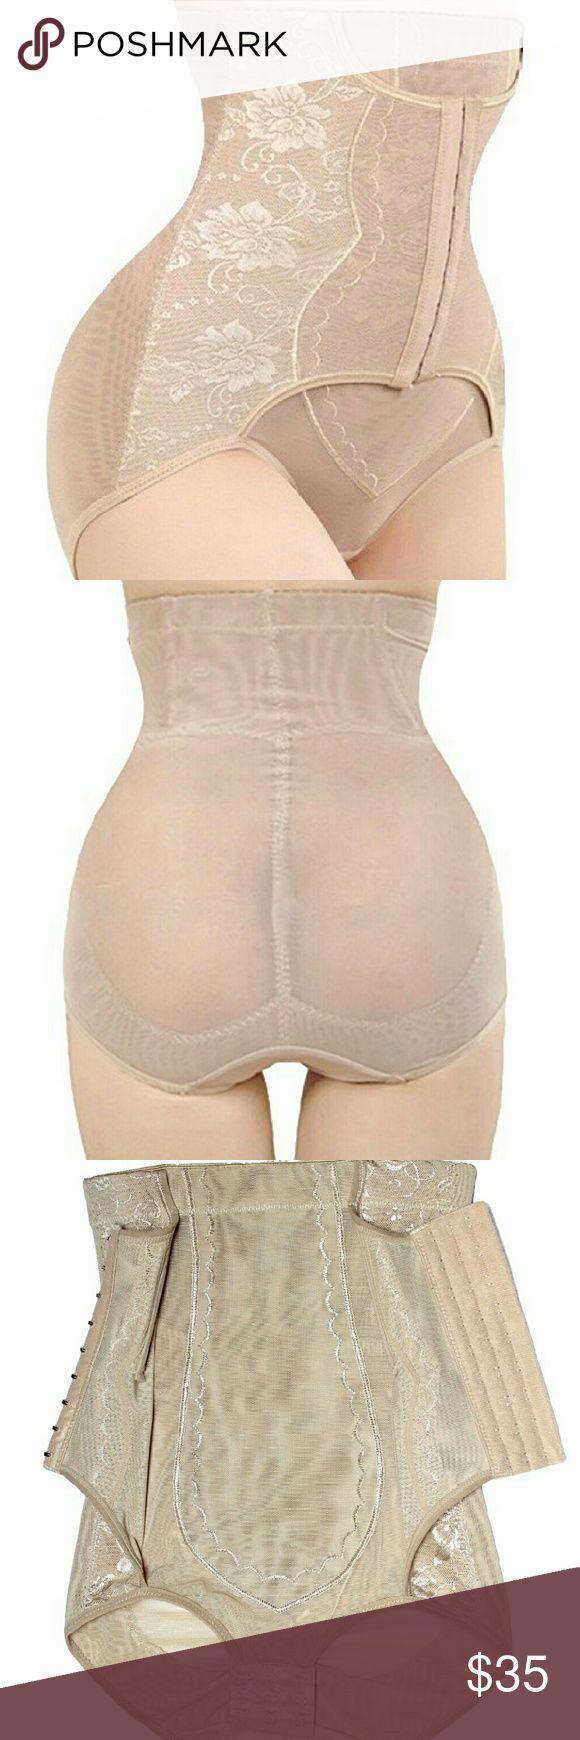 Clip zip waist trainer perfect floral design waist training cinchers - Brand New With Tag Shaperqueen 1020 Women Best Waist Cincher Girdle Belly Trainer Corset Body Shapewear